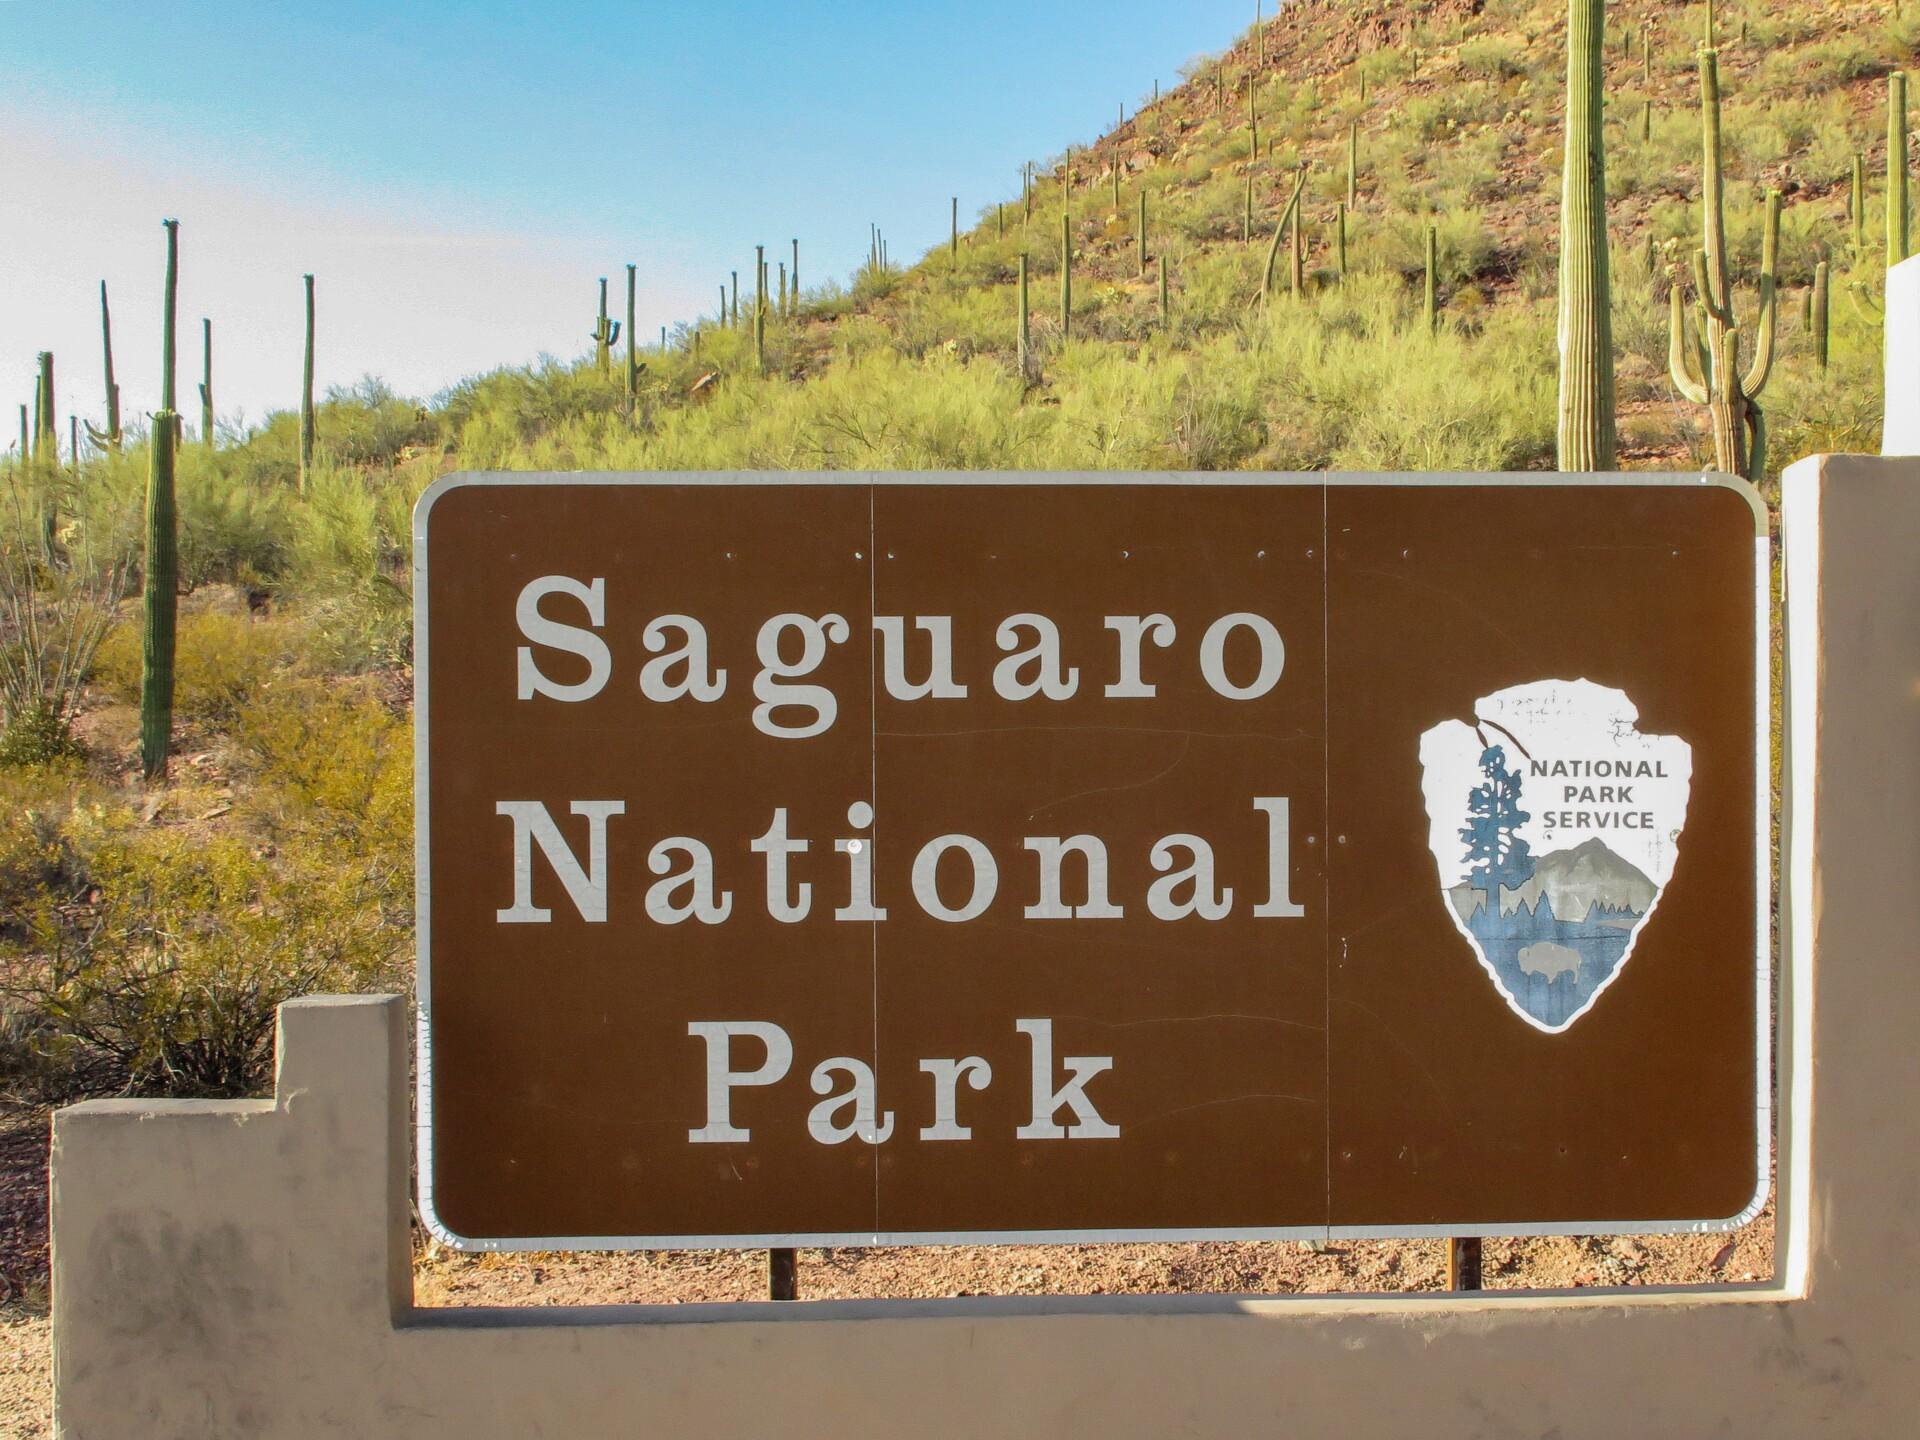 Saguaro_National_Park_(West)_1 WIKICOMMONS.jpg